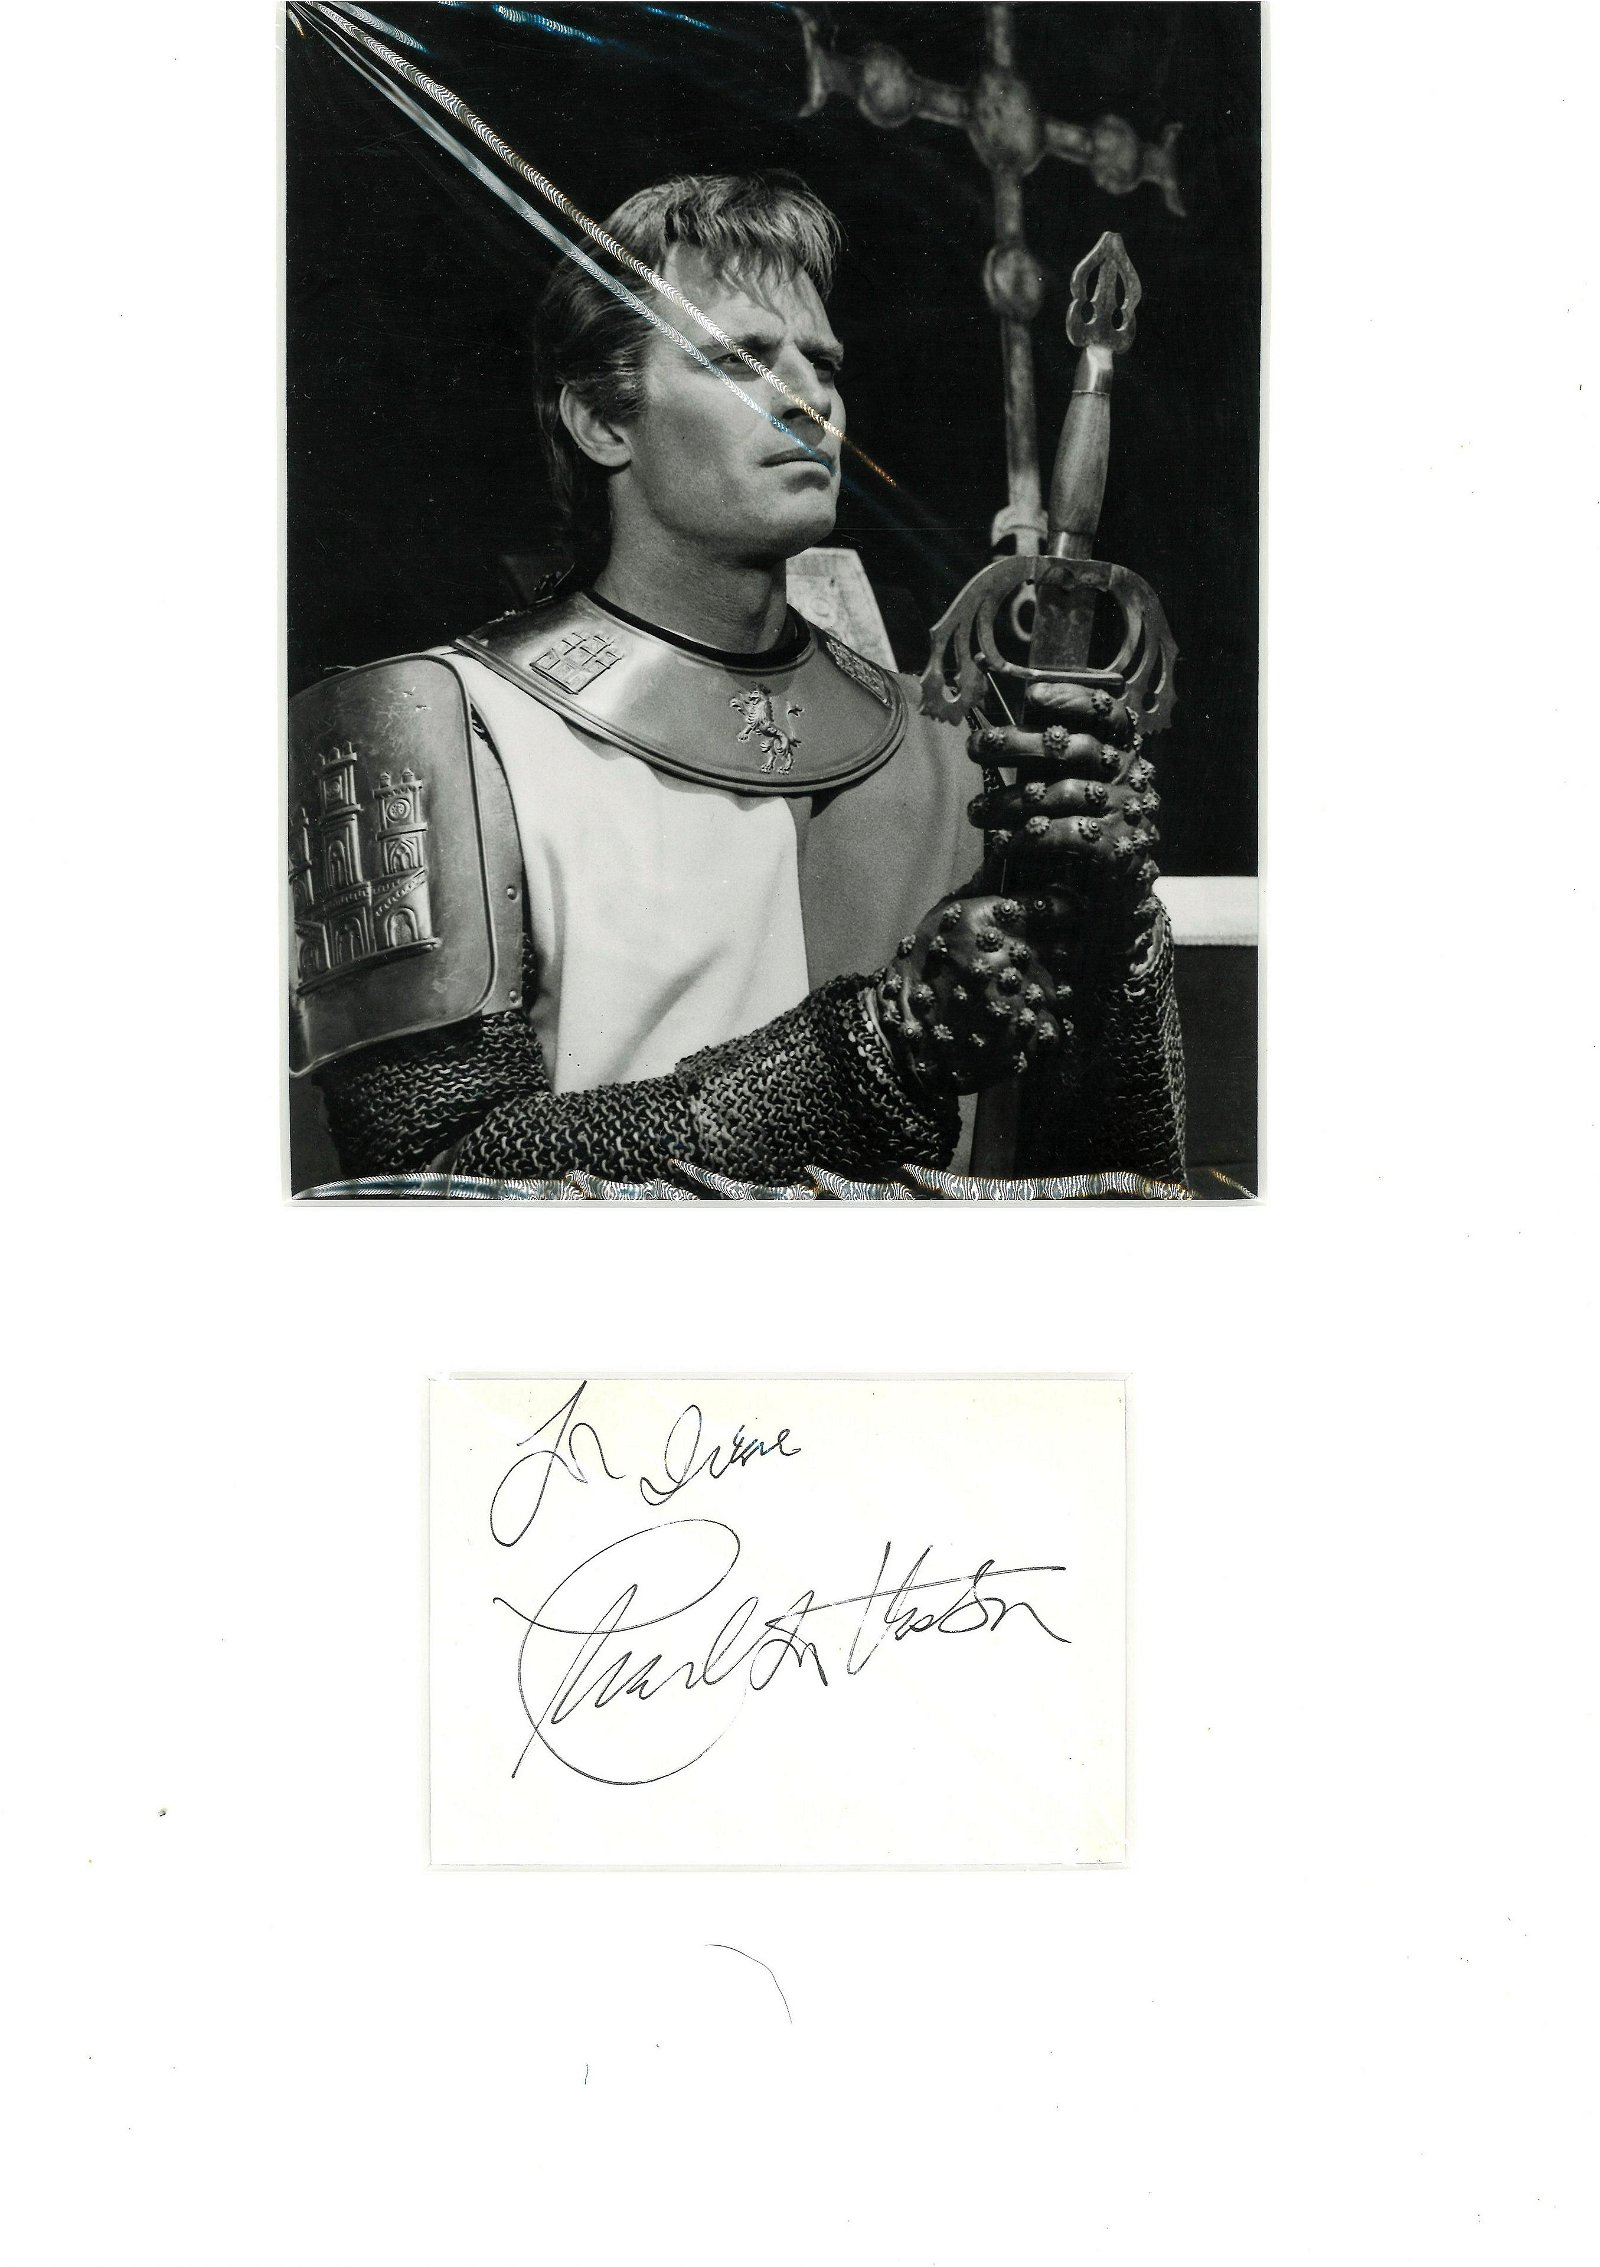 Charlton Heston signature piece mounted below black and